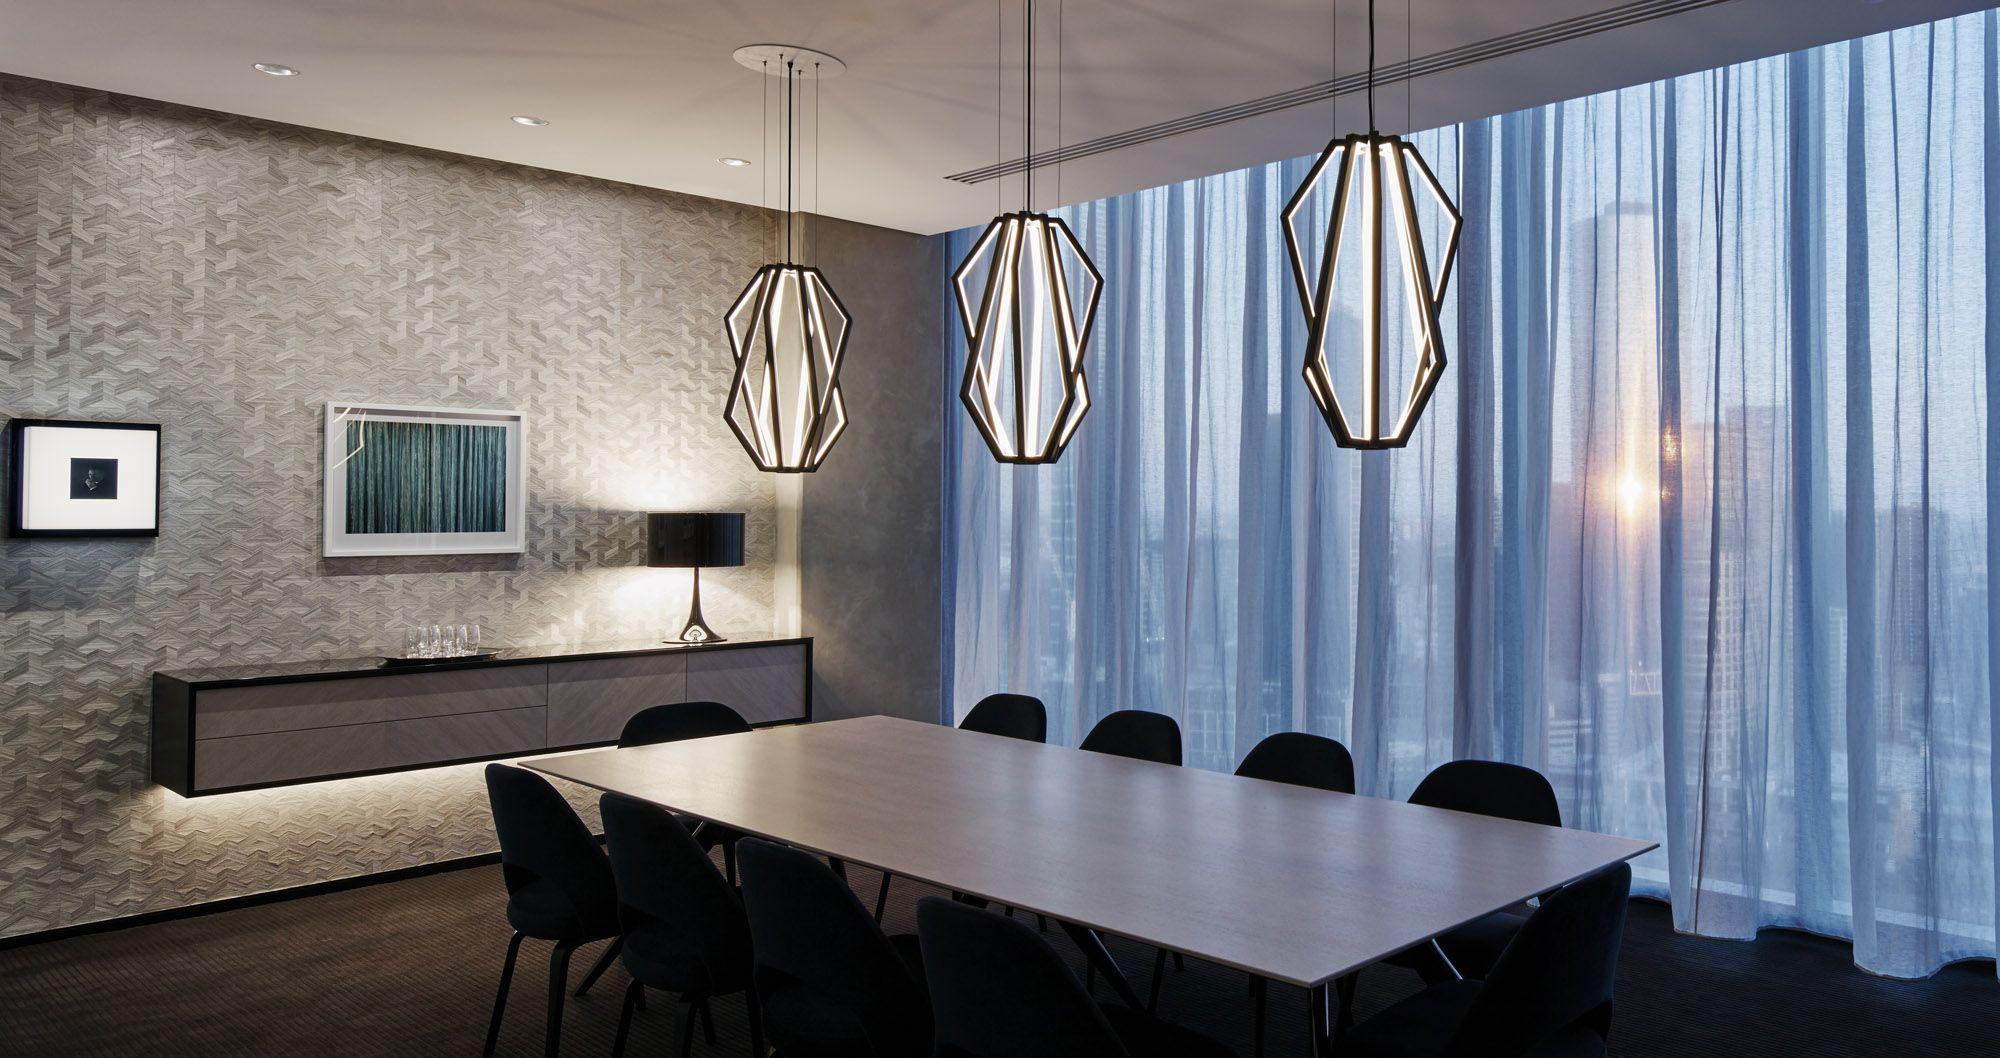 Bathroom Lighting Fixtures Melbourne corrs chambers westgarth melbourne * lighting design